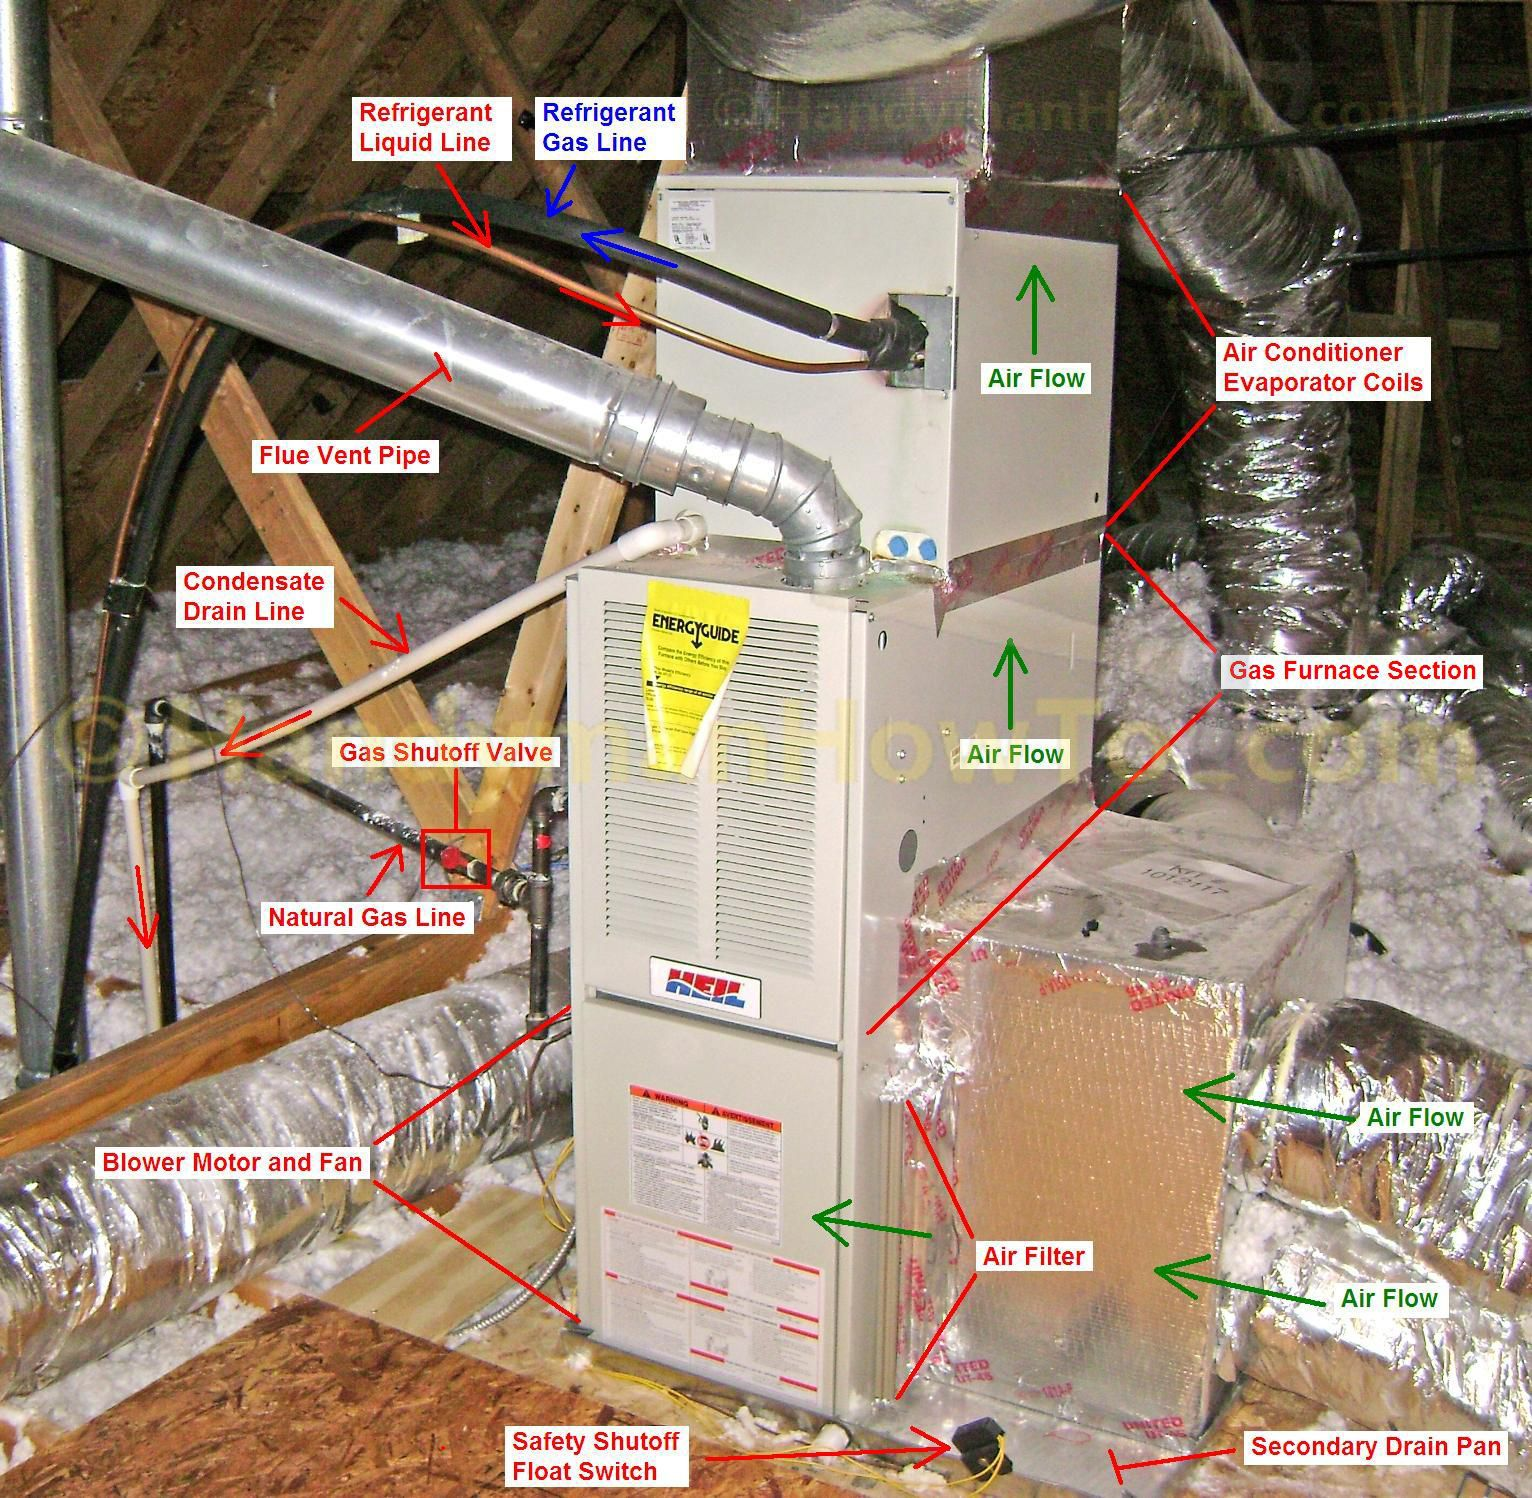 Photo tutorial explaining how to clean AC evaporator coils